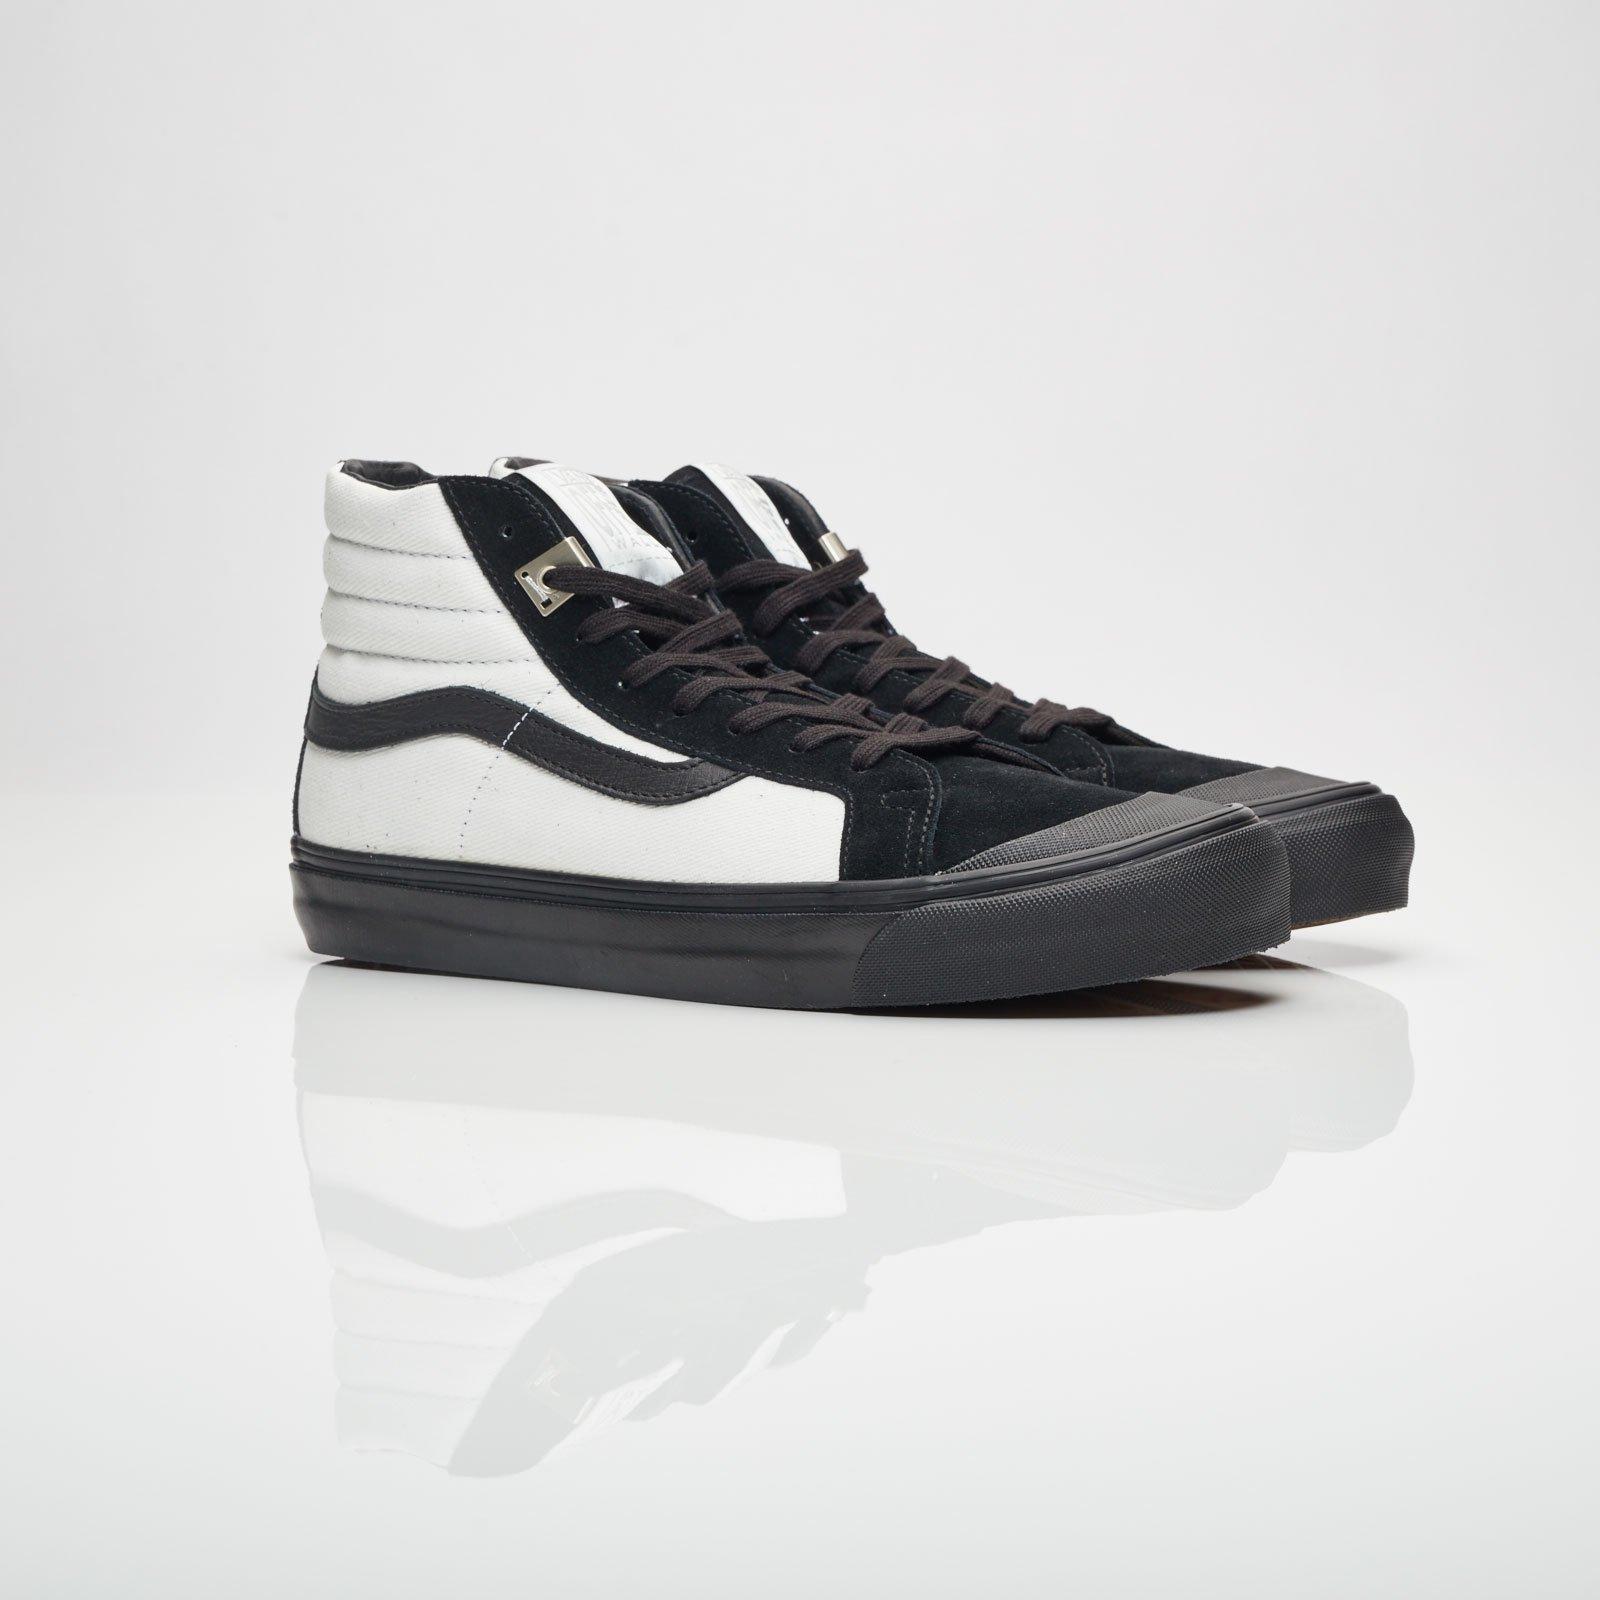 ALYX X Vans OG 138 LX Sneakers QtqnN0eFf